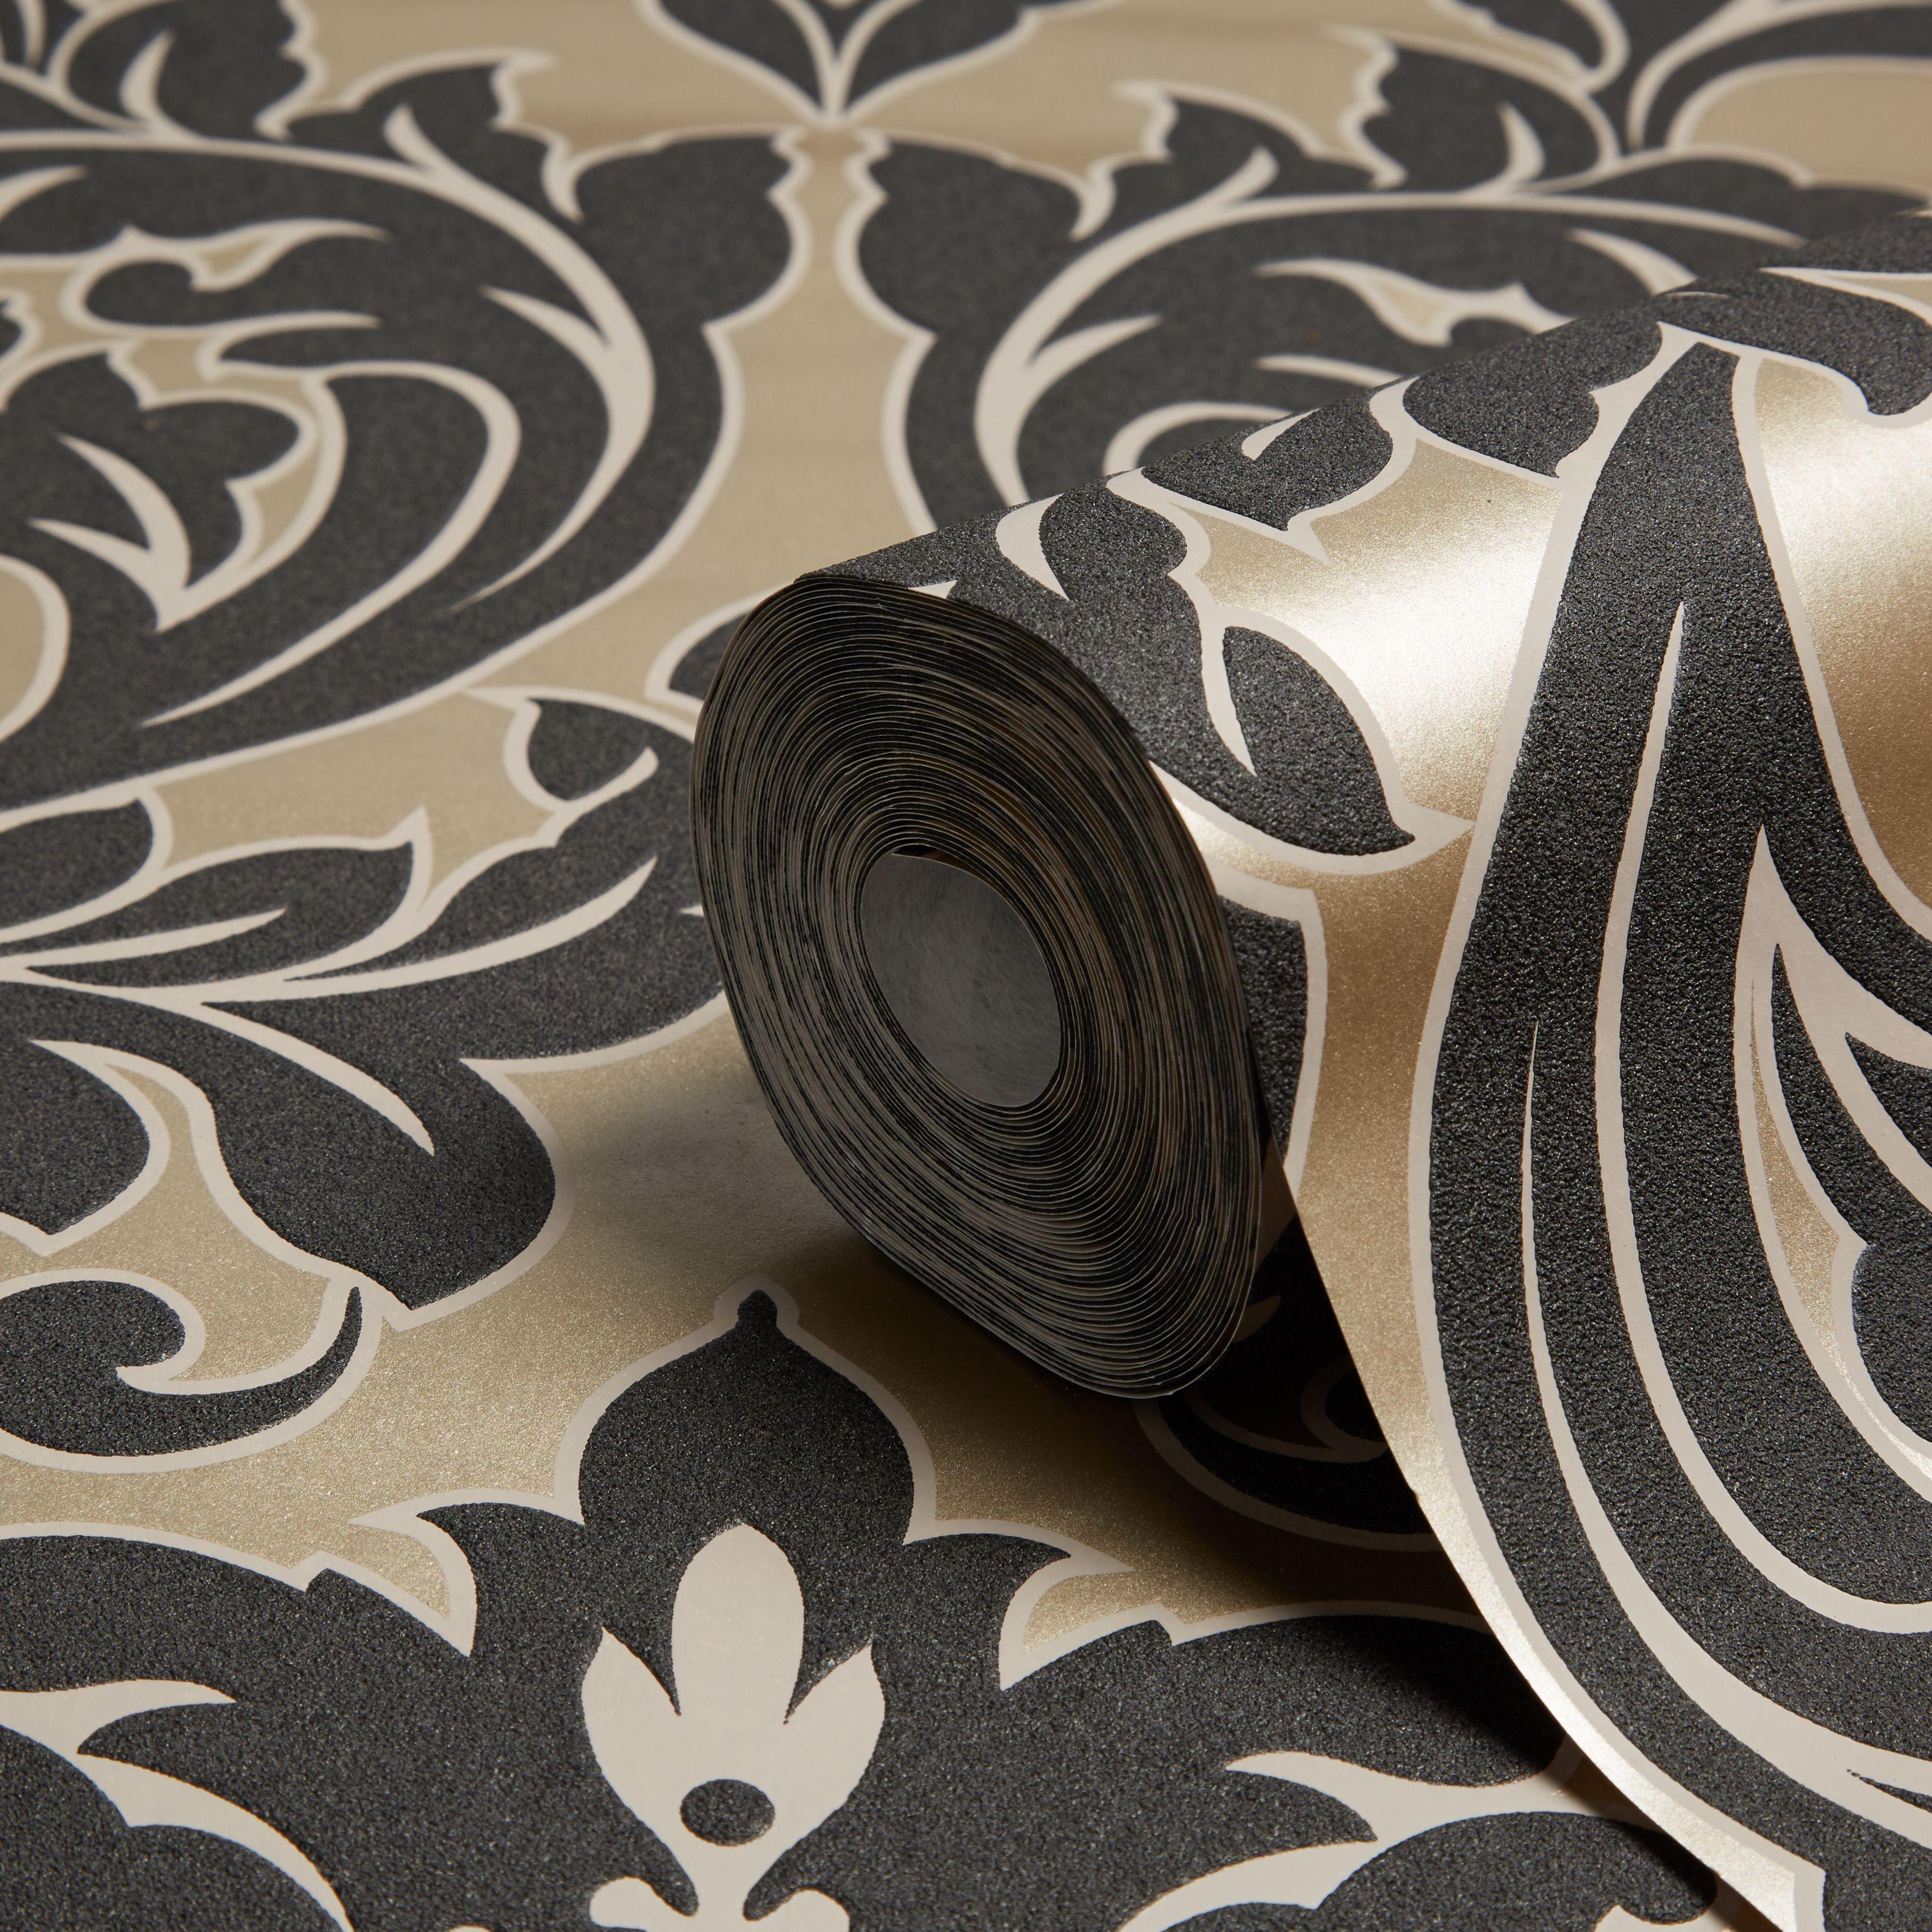 graham u0026 brown superfresco easy black u0026 gold effect damask metallic effect wallpaper